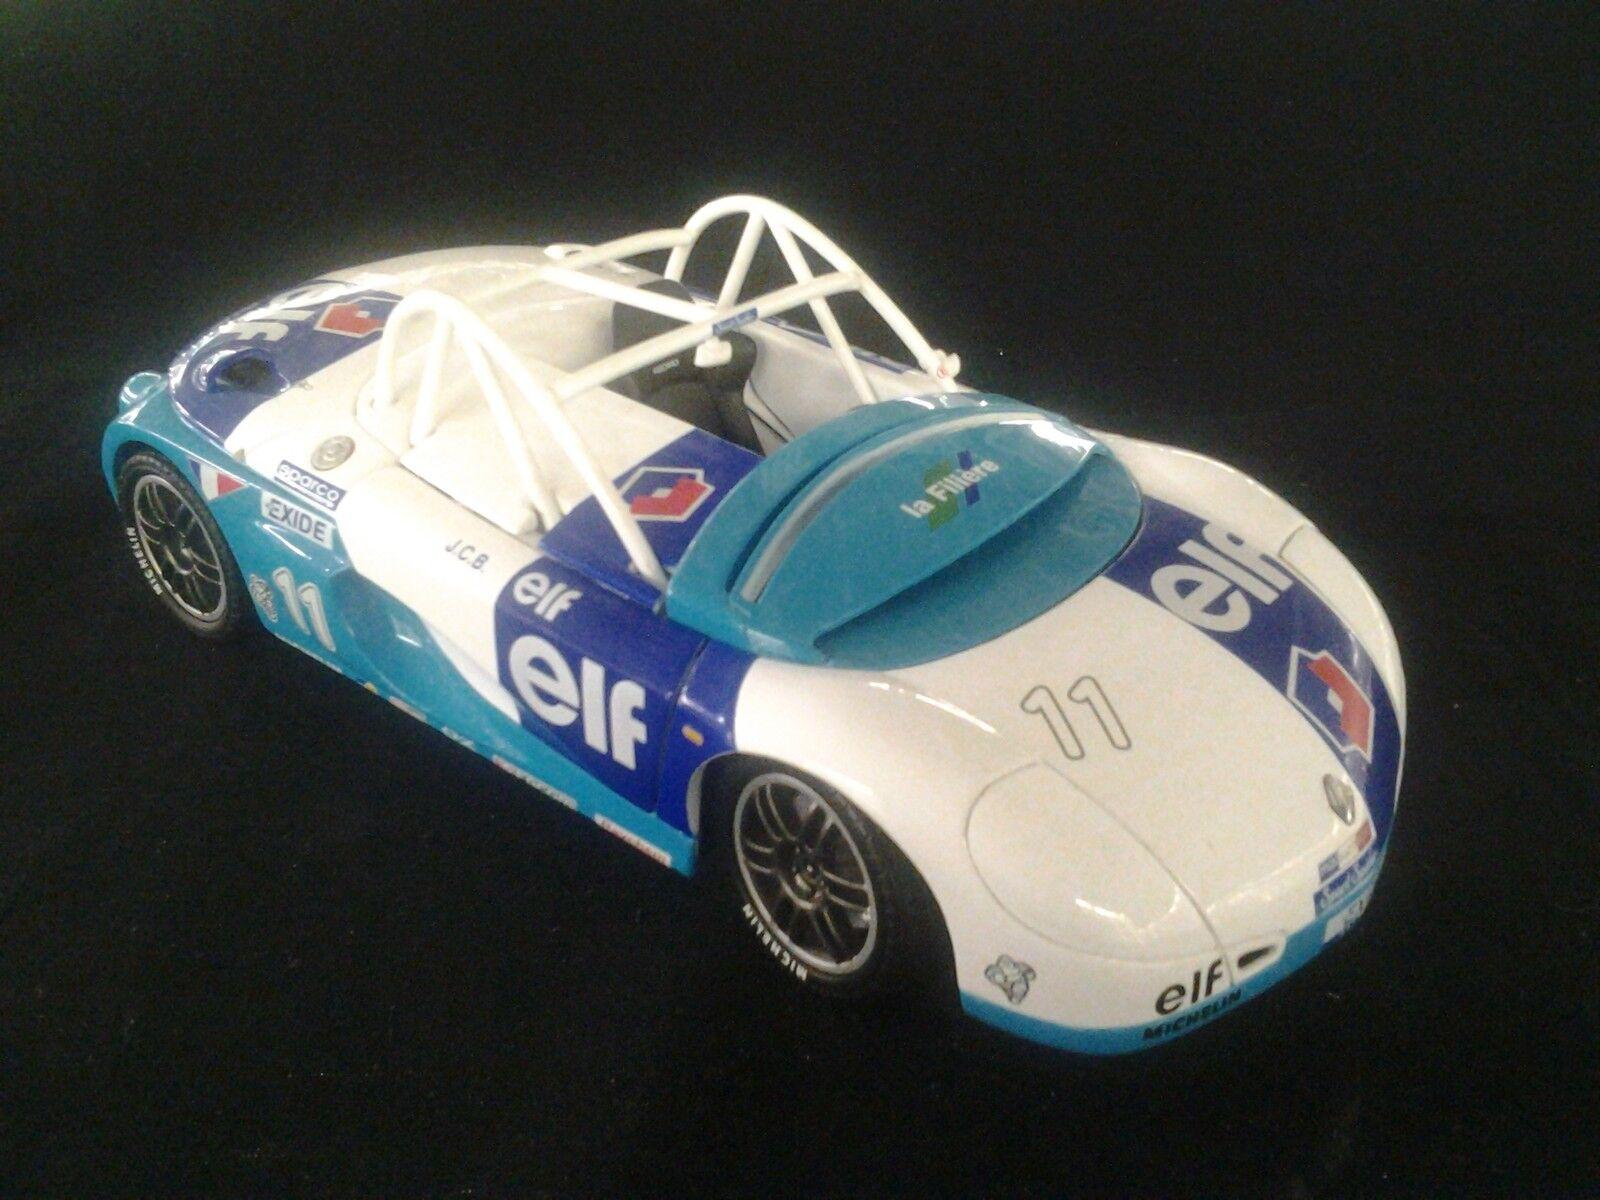 marca en liquidación de venta Anson Elf Renault Sport Spyder Spyder Spyder 1 18  11 Jean-Christophe Boullion (FRA) (MCC)  suministramos lo mejor